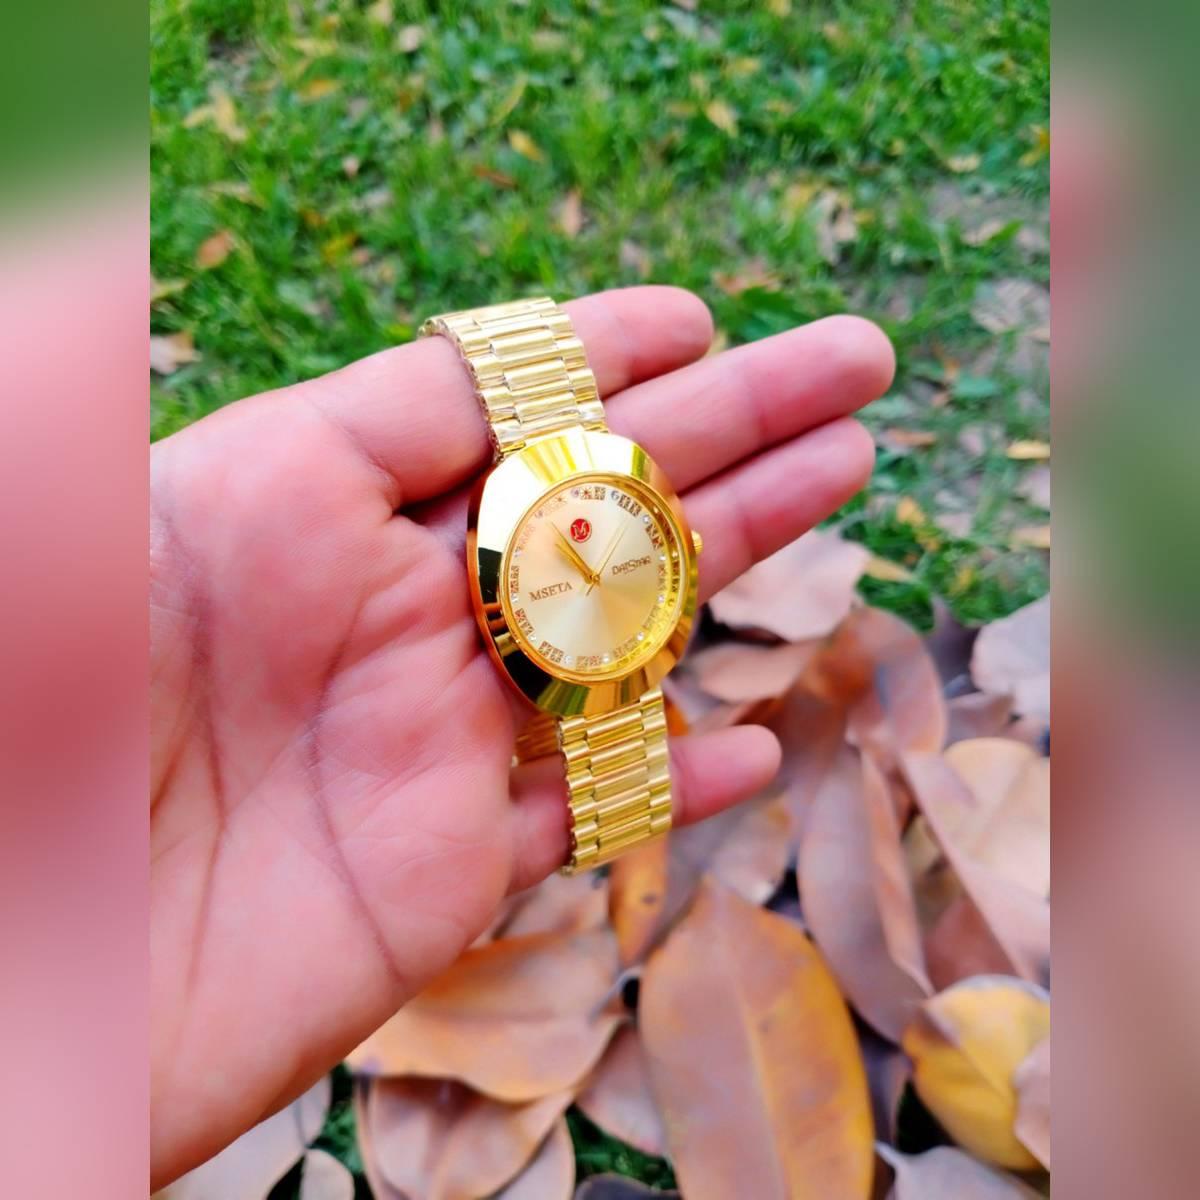 Luxury Gold Men's Wrist Watch Tourbillon Mechanical Waterproof Watch Gift For Family & Friends